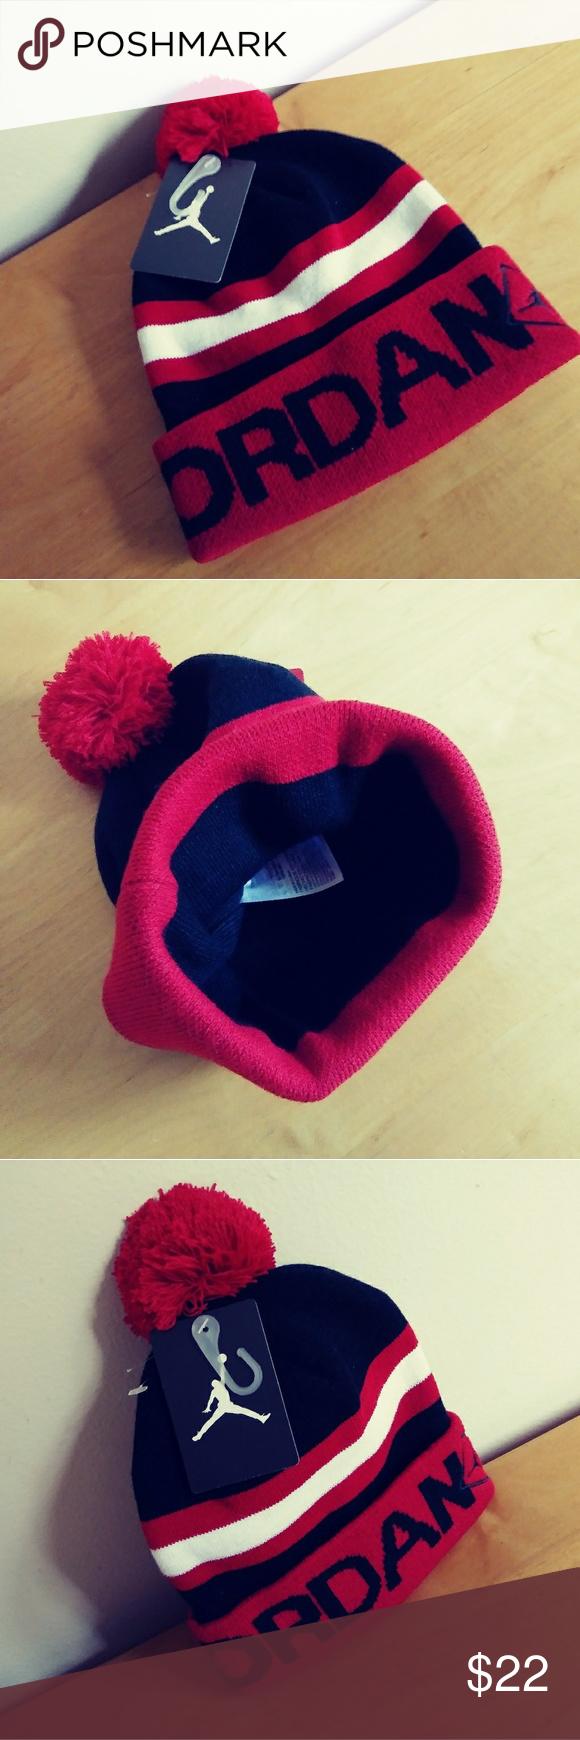 kids nike winter hats on poshmark popular stores f57c7 47f32 ... b5e1945f1dc2